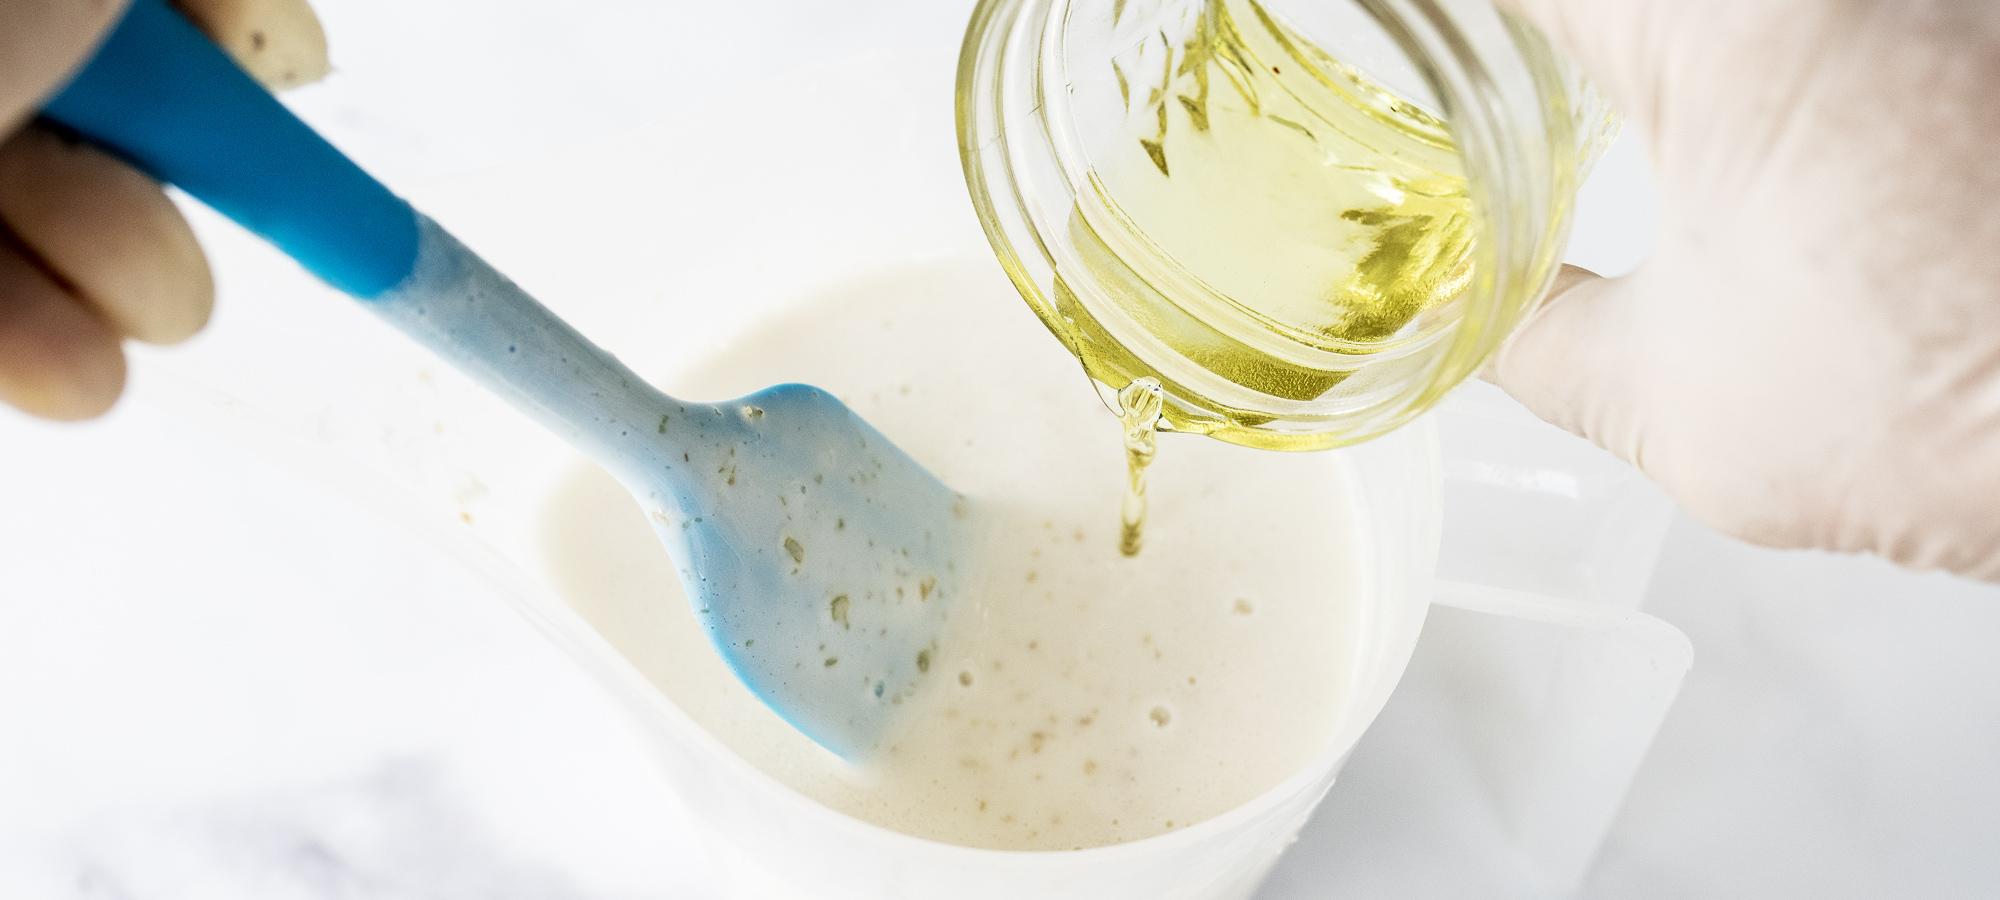 Adding fragrance oil to oatmeal shea soap base.